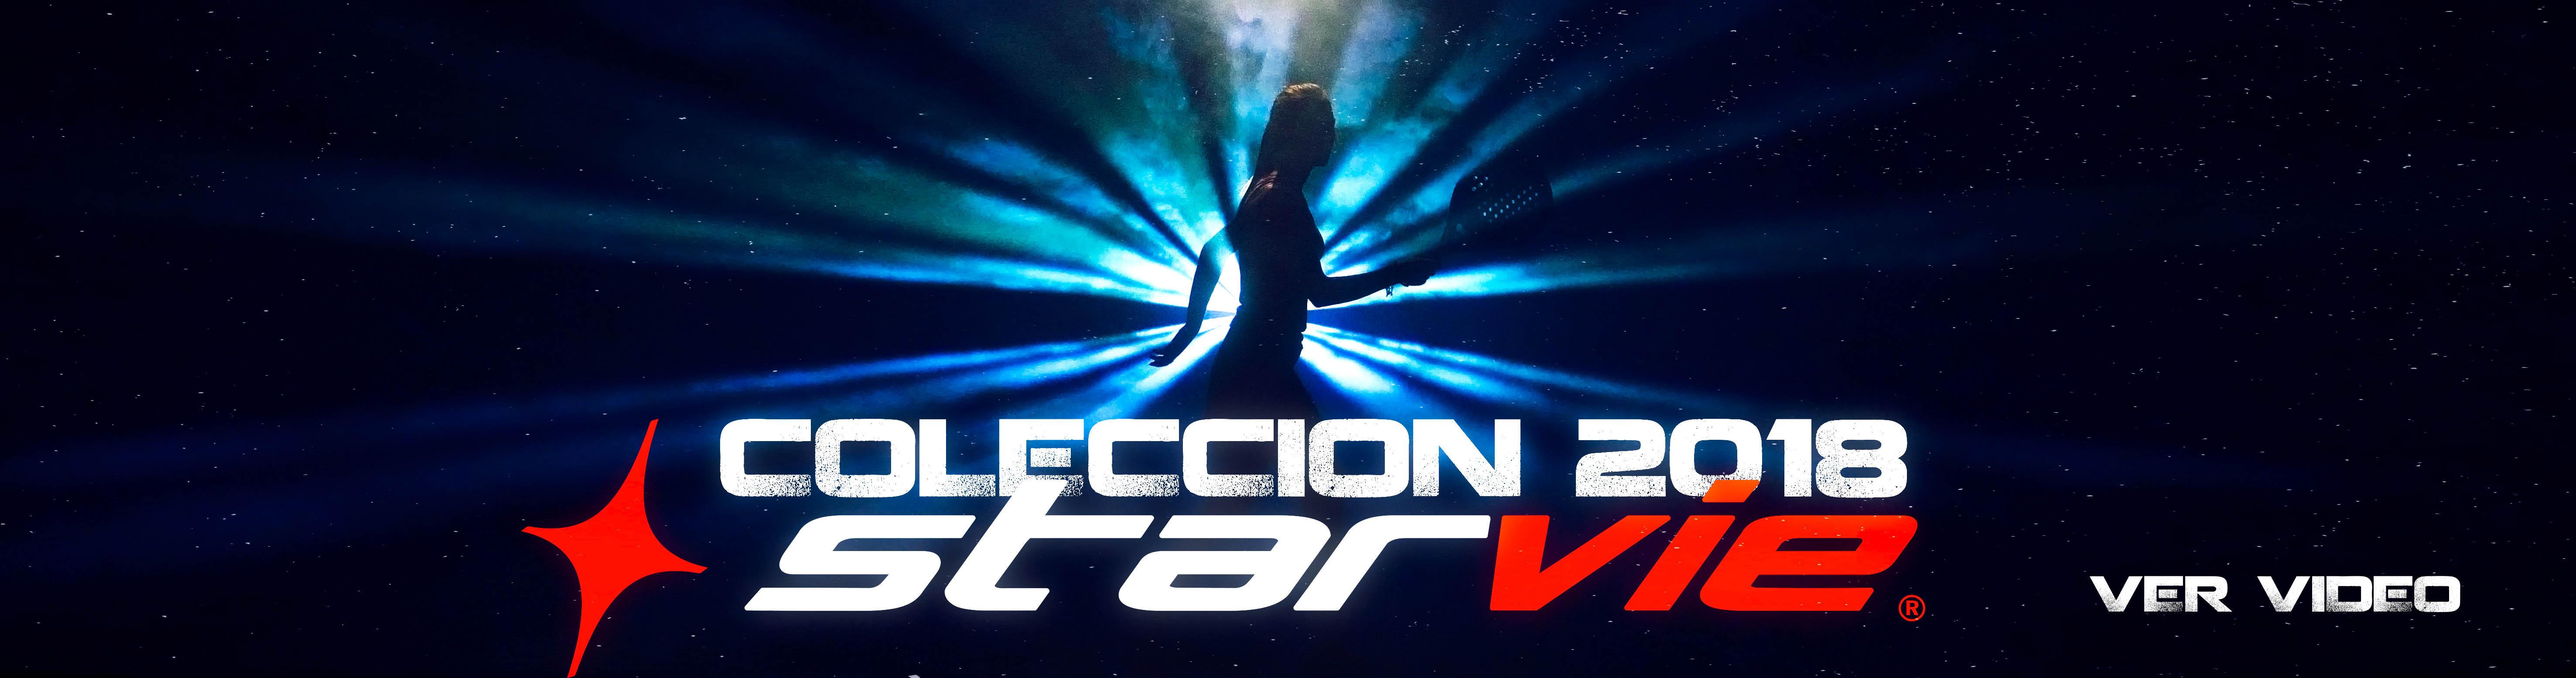 Video Coleccion Palas de Pádel 2018 - StarVie